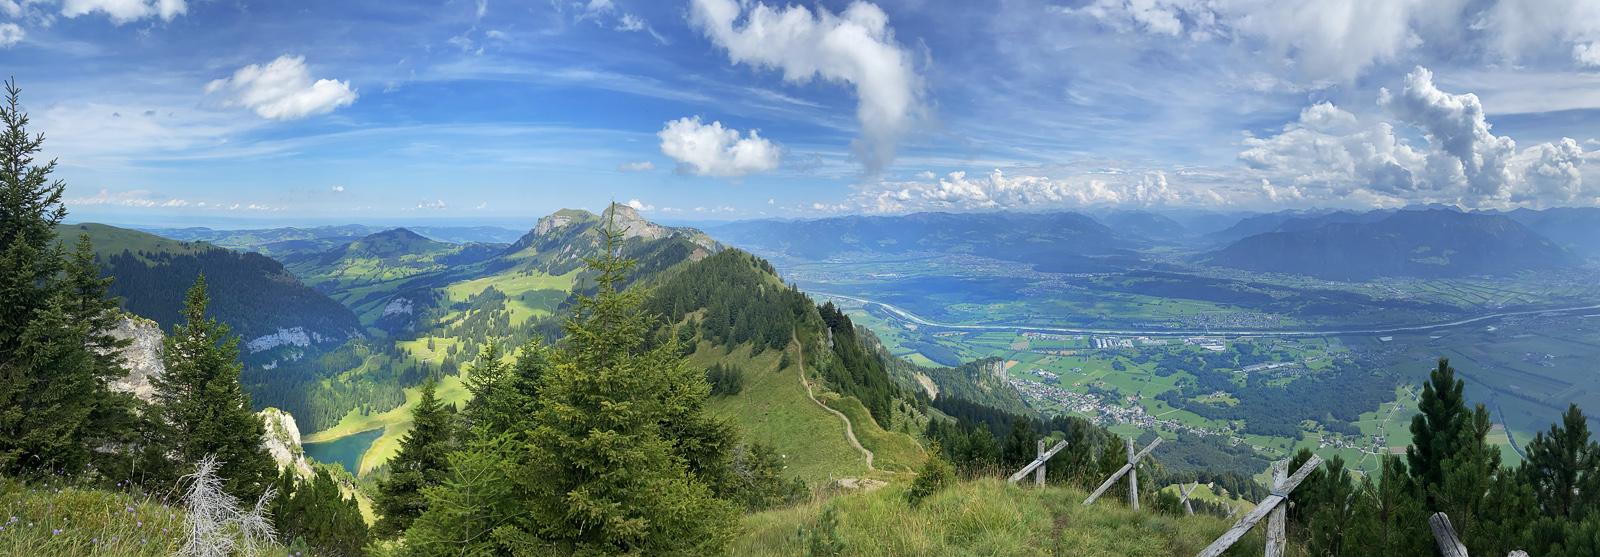 Alpstein_Kasten_7843